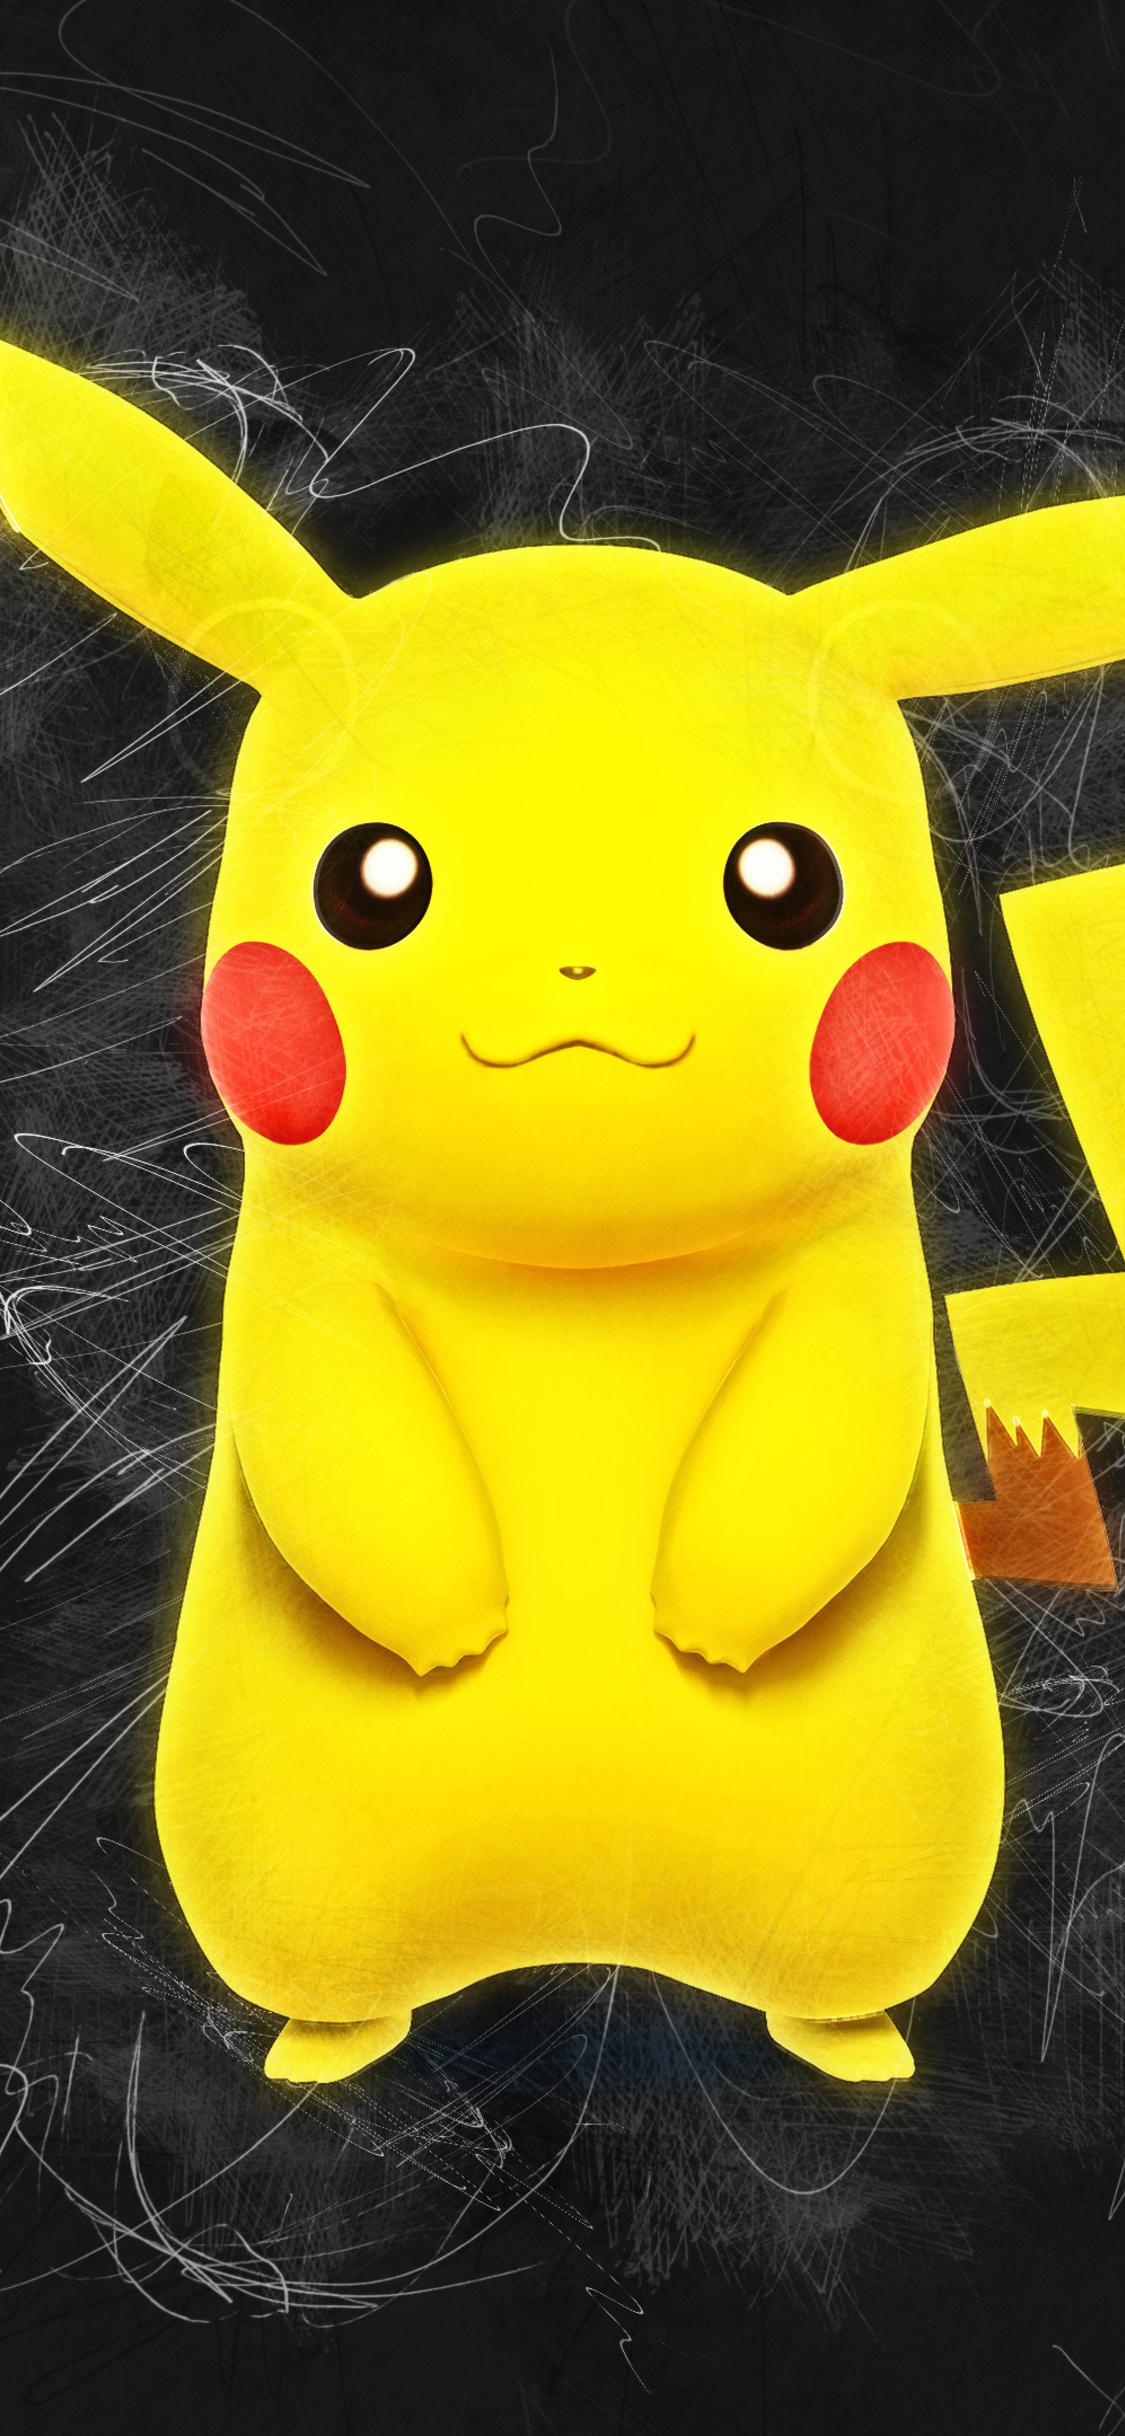 pikachu-artwork-4k-gt.jpg